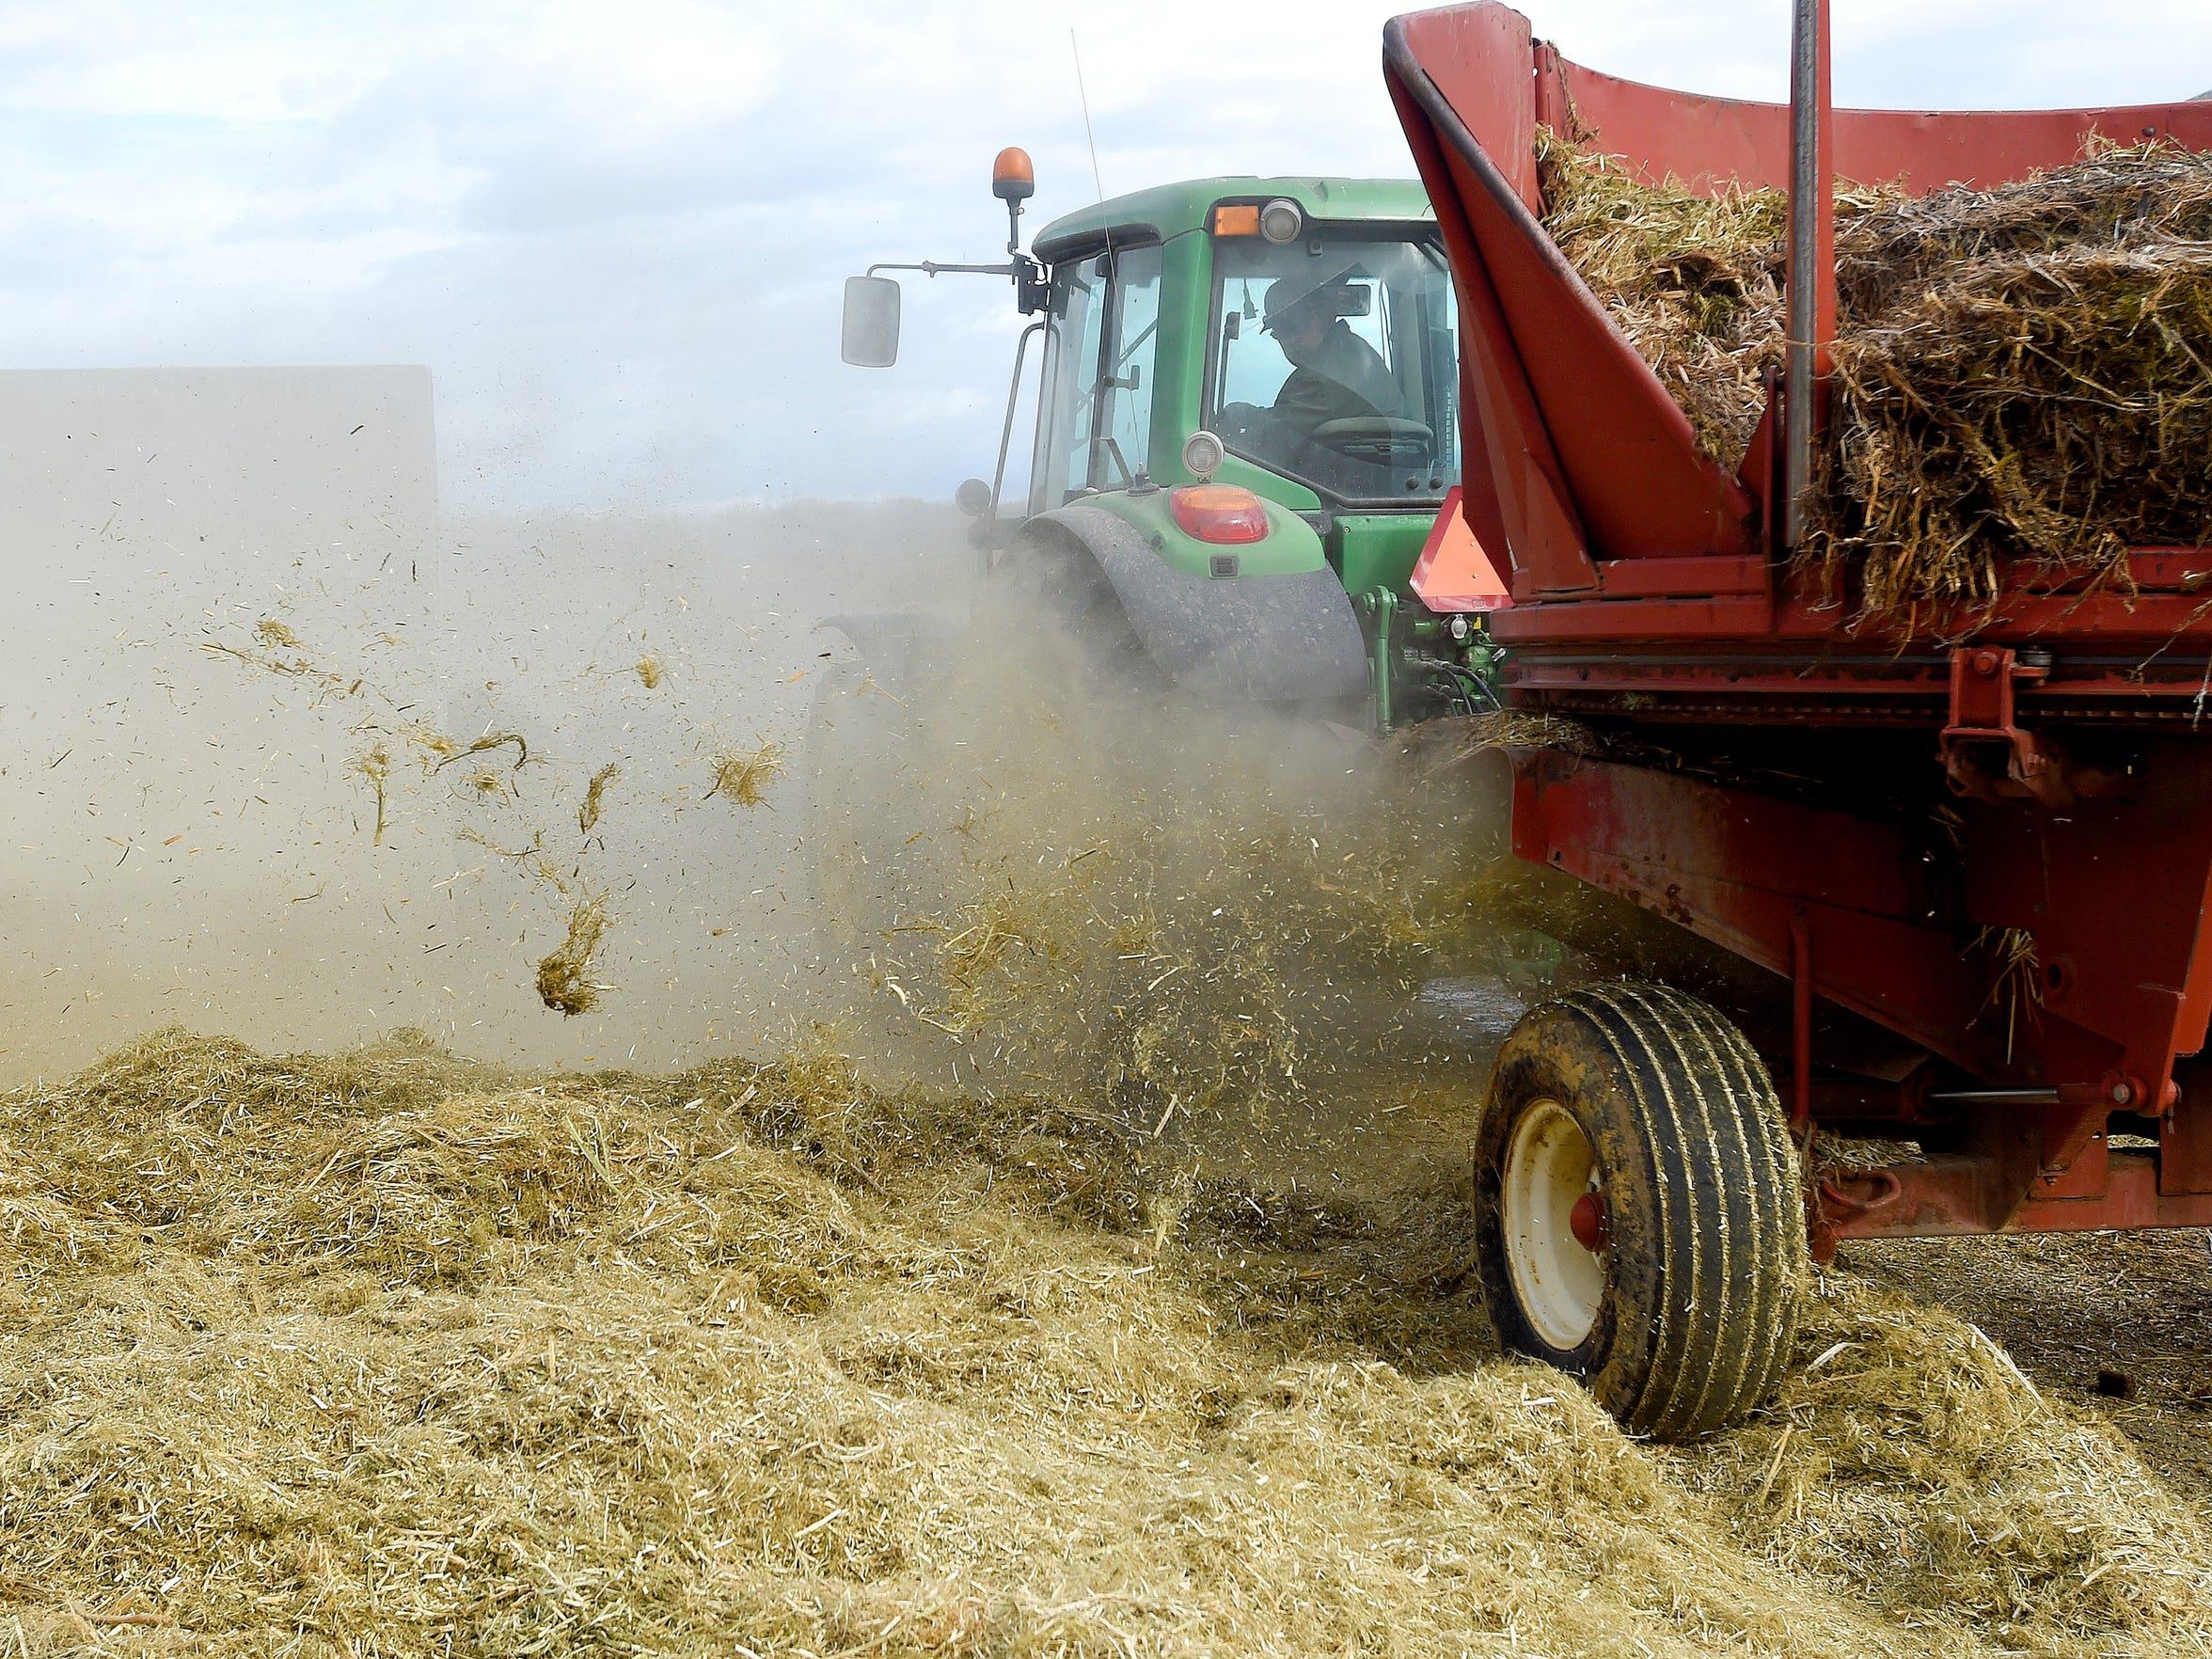 A round bale of hemp is shredded at Riverhill Farm